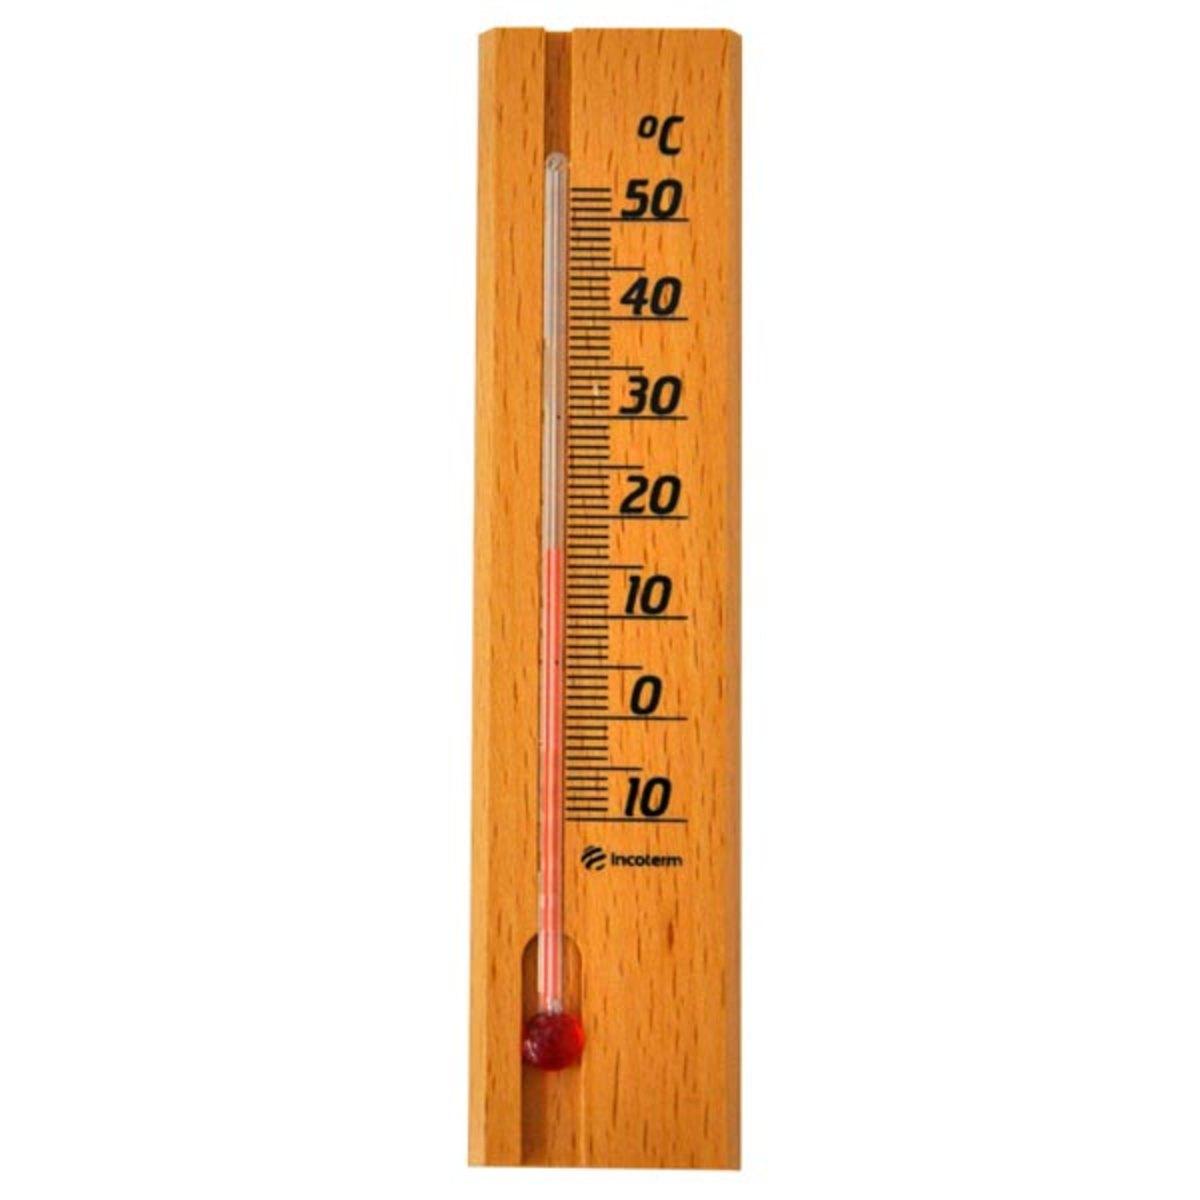 Termometro Ambiente base de madeira Incoterm  - Agrodove